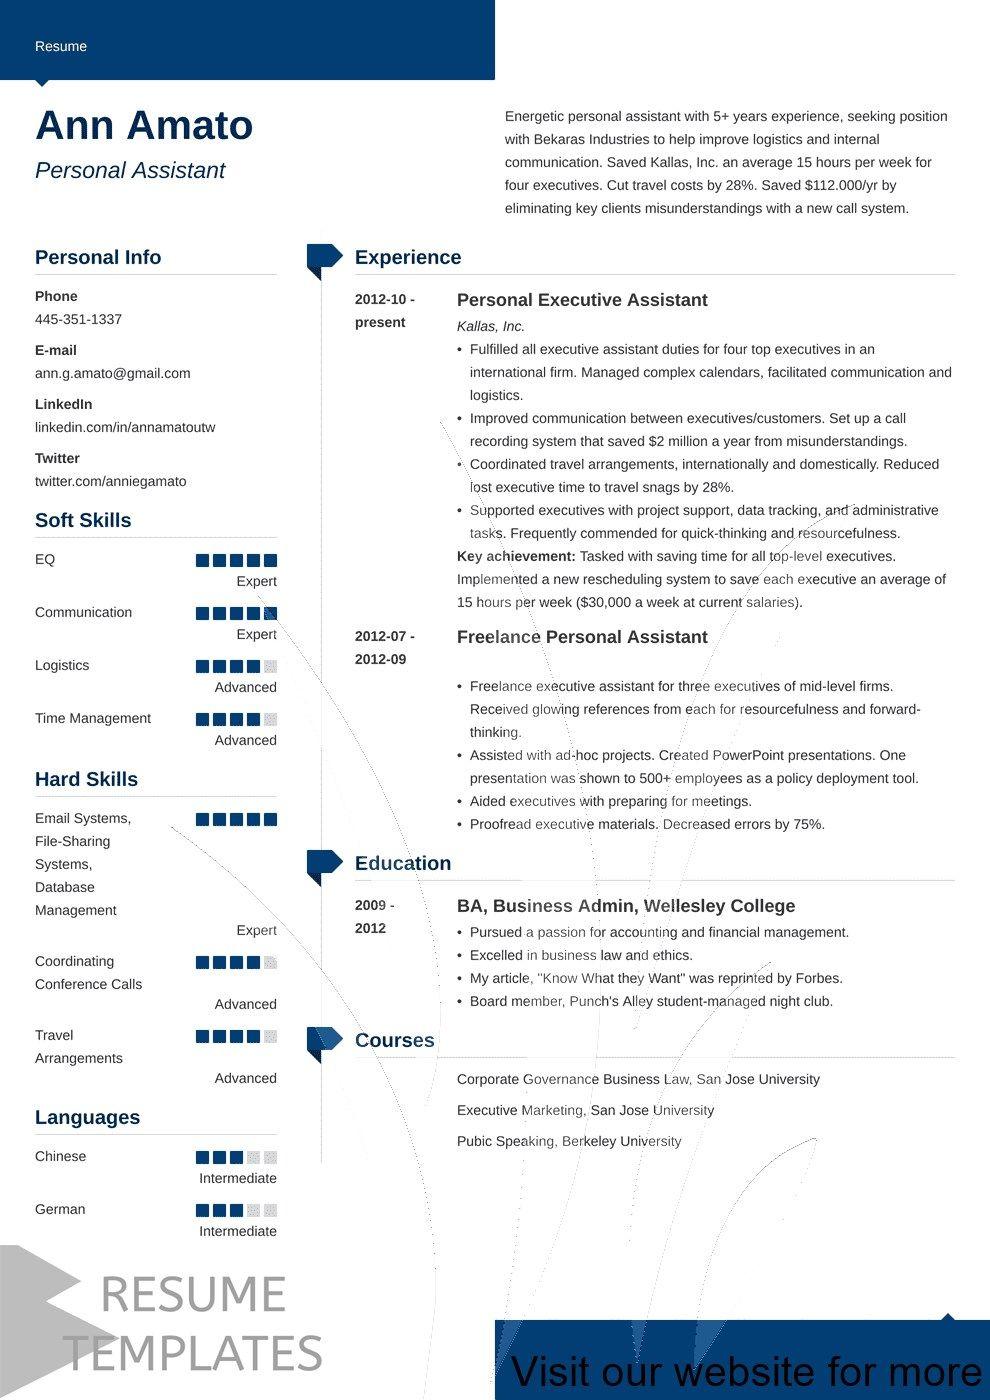 free resume builder templates Best in 2020 Job resume